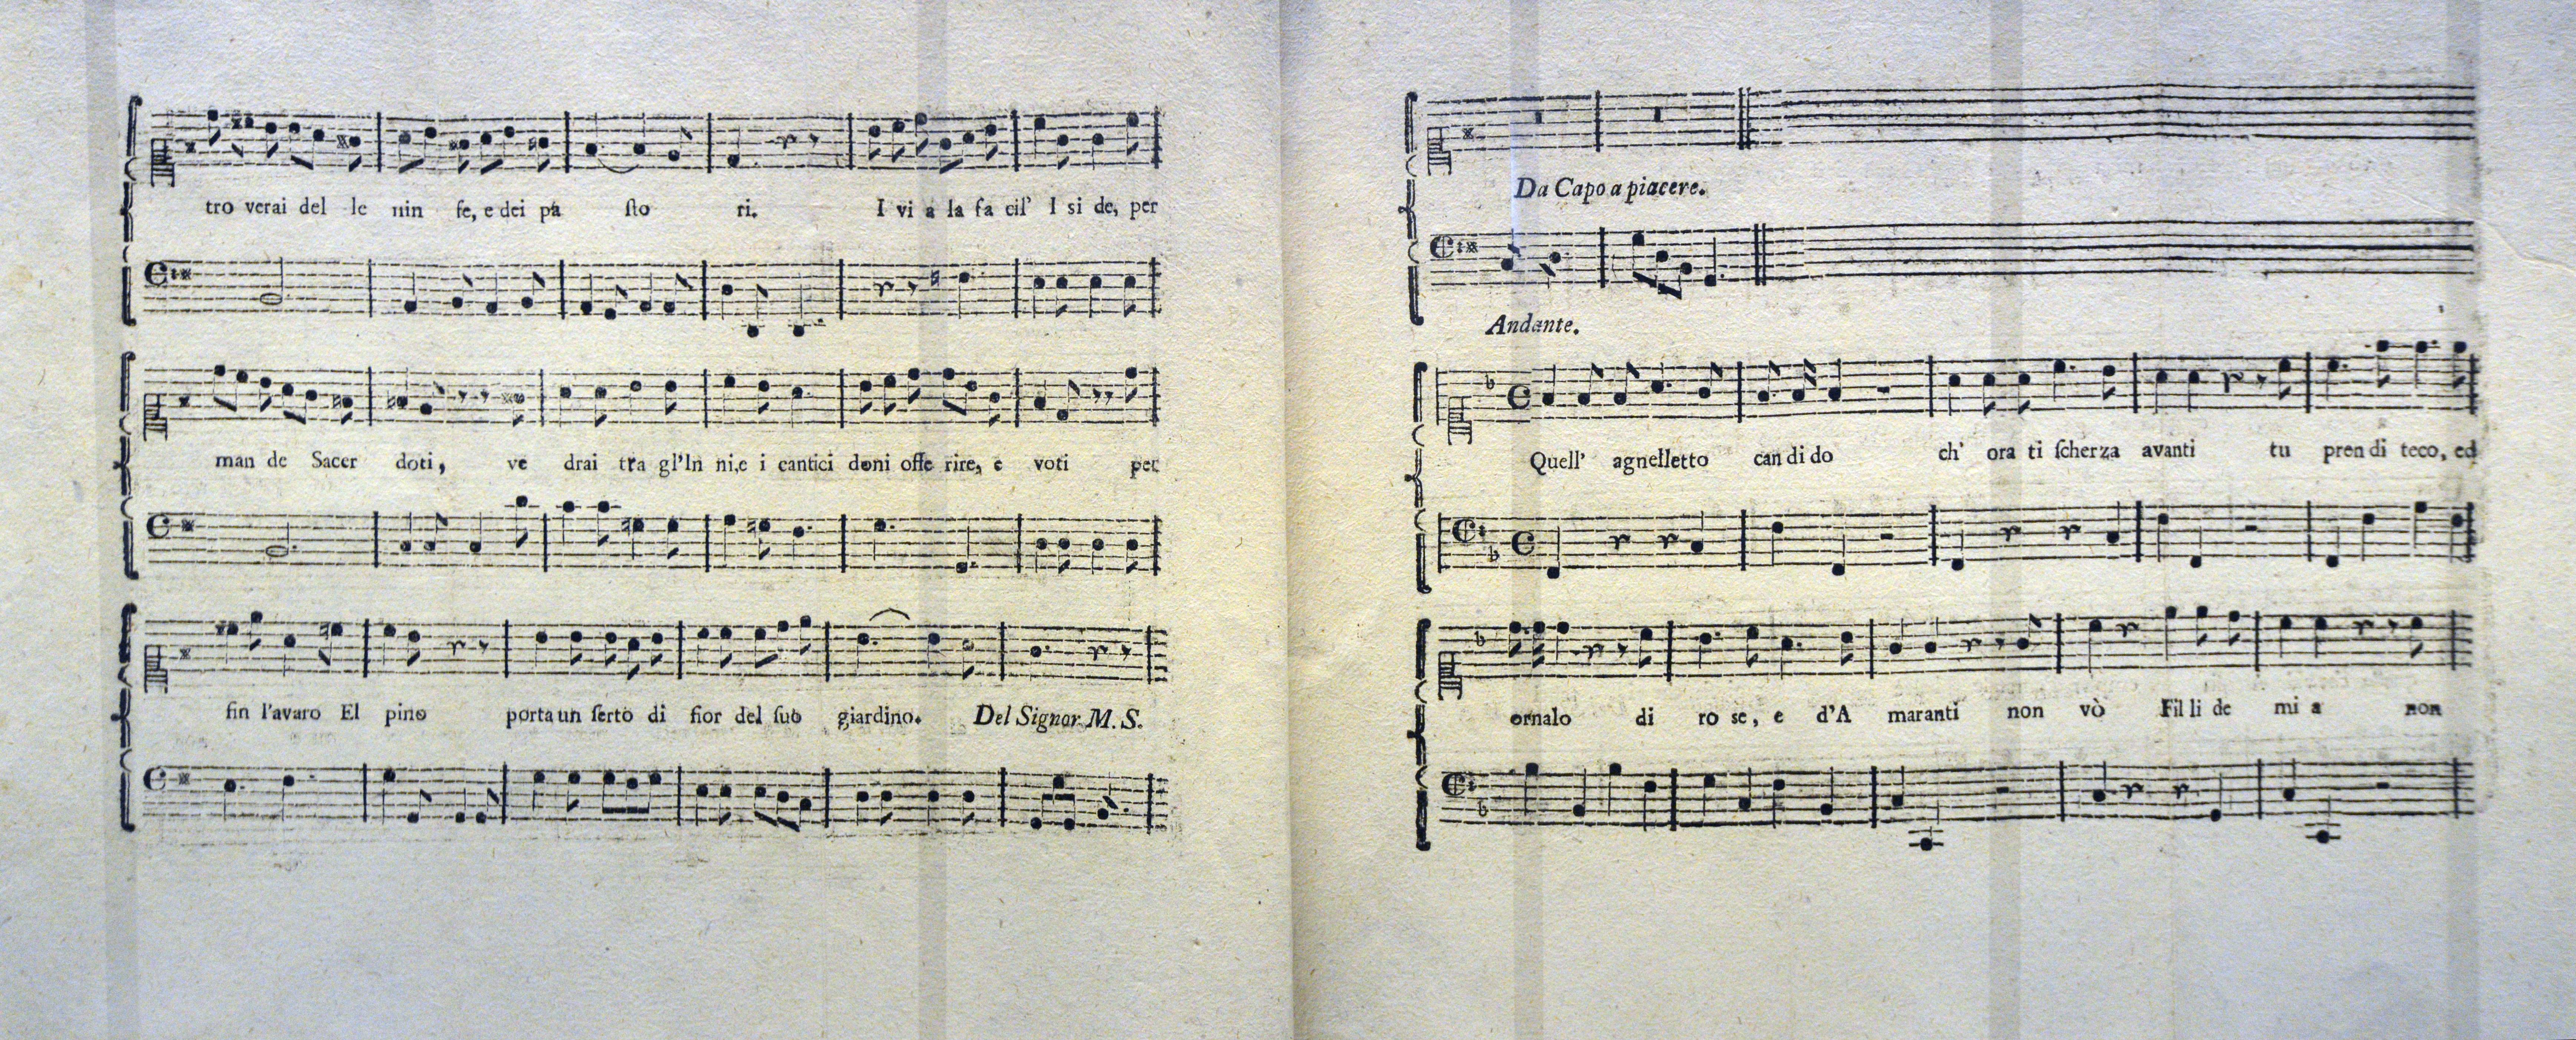 SCARICARE OPERA MUSICALE RONDO TURCA MOZART